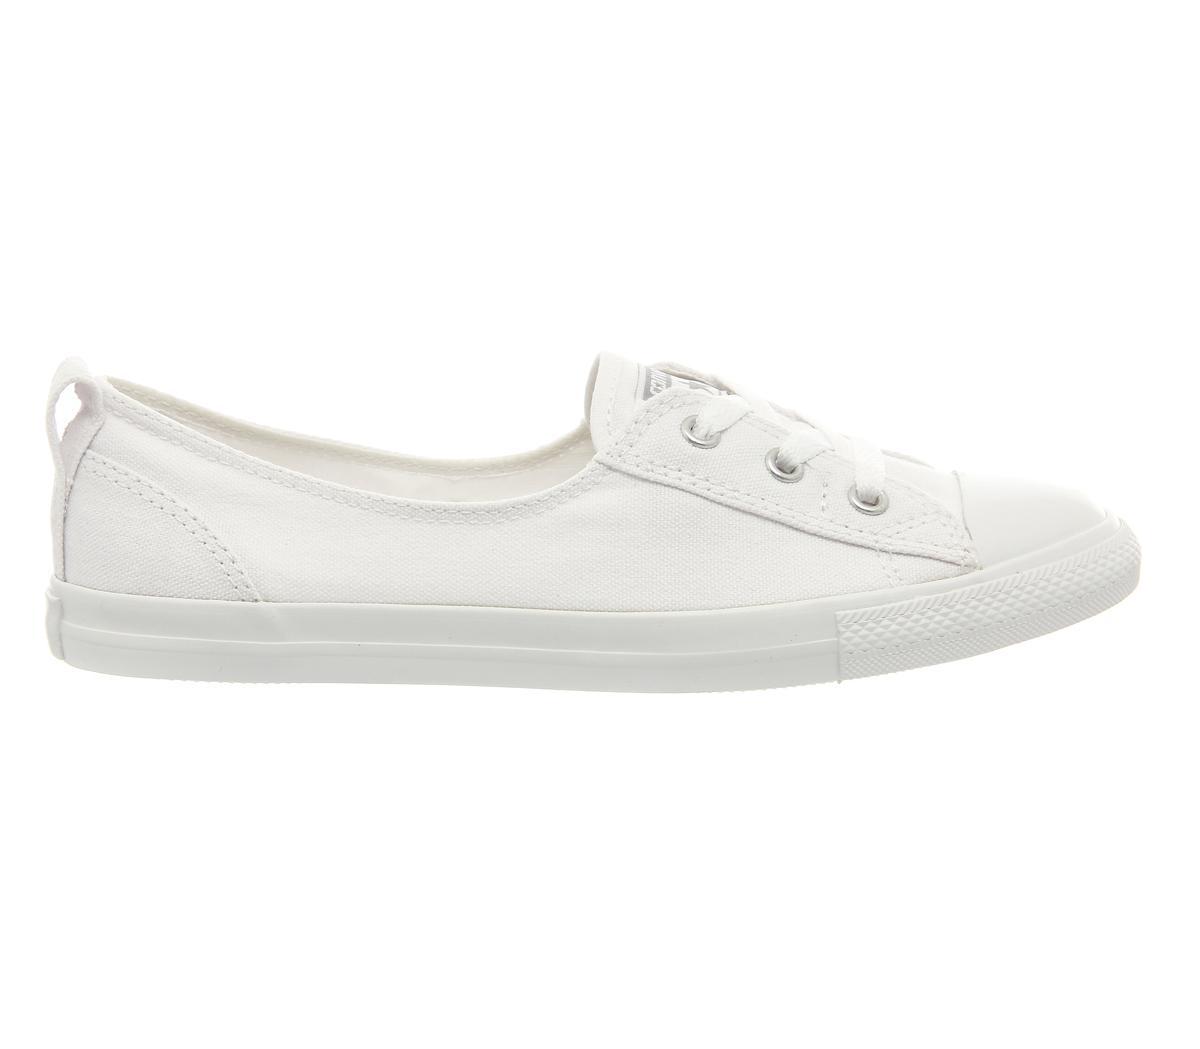 Ctas ballet lace white dress